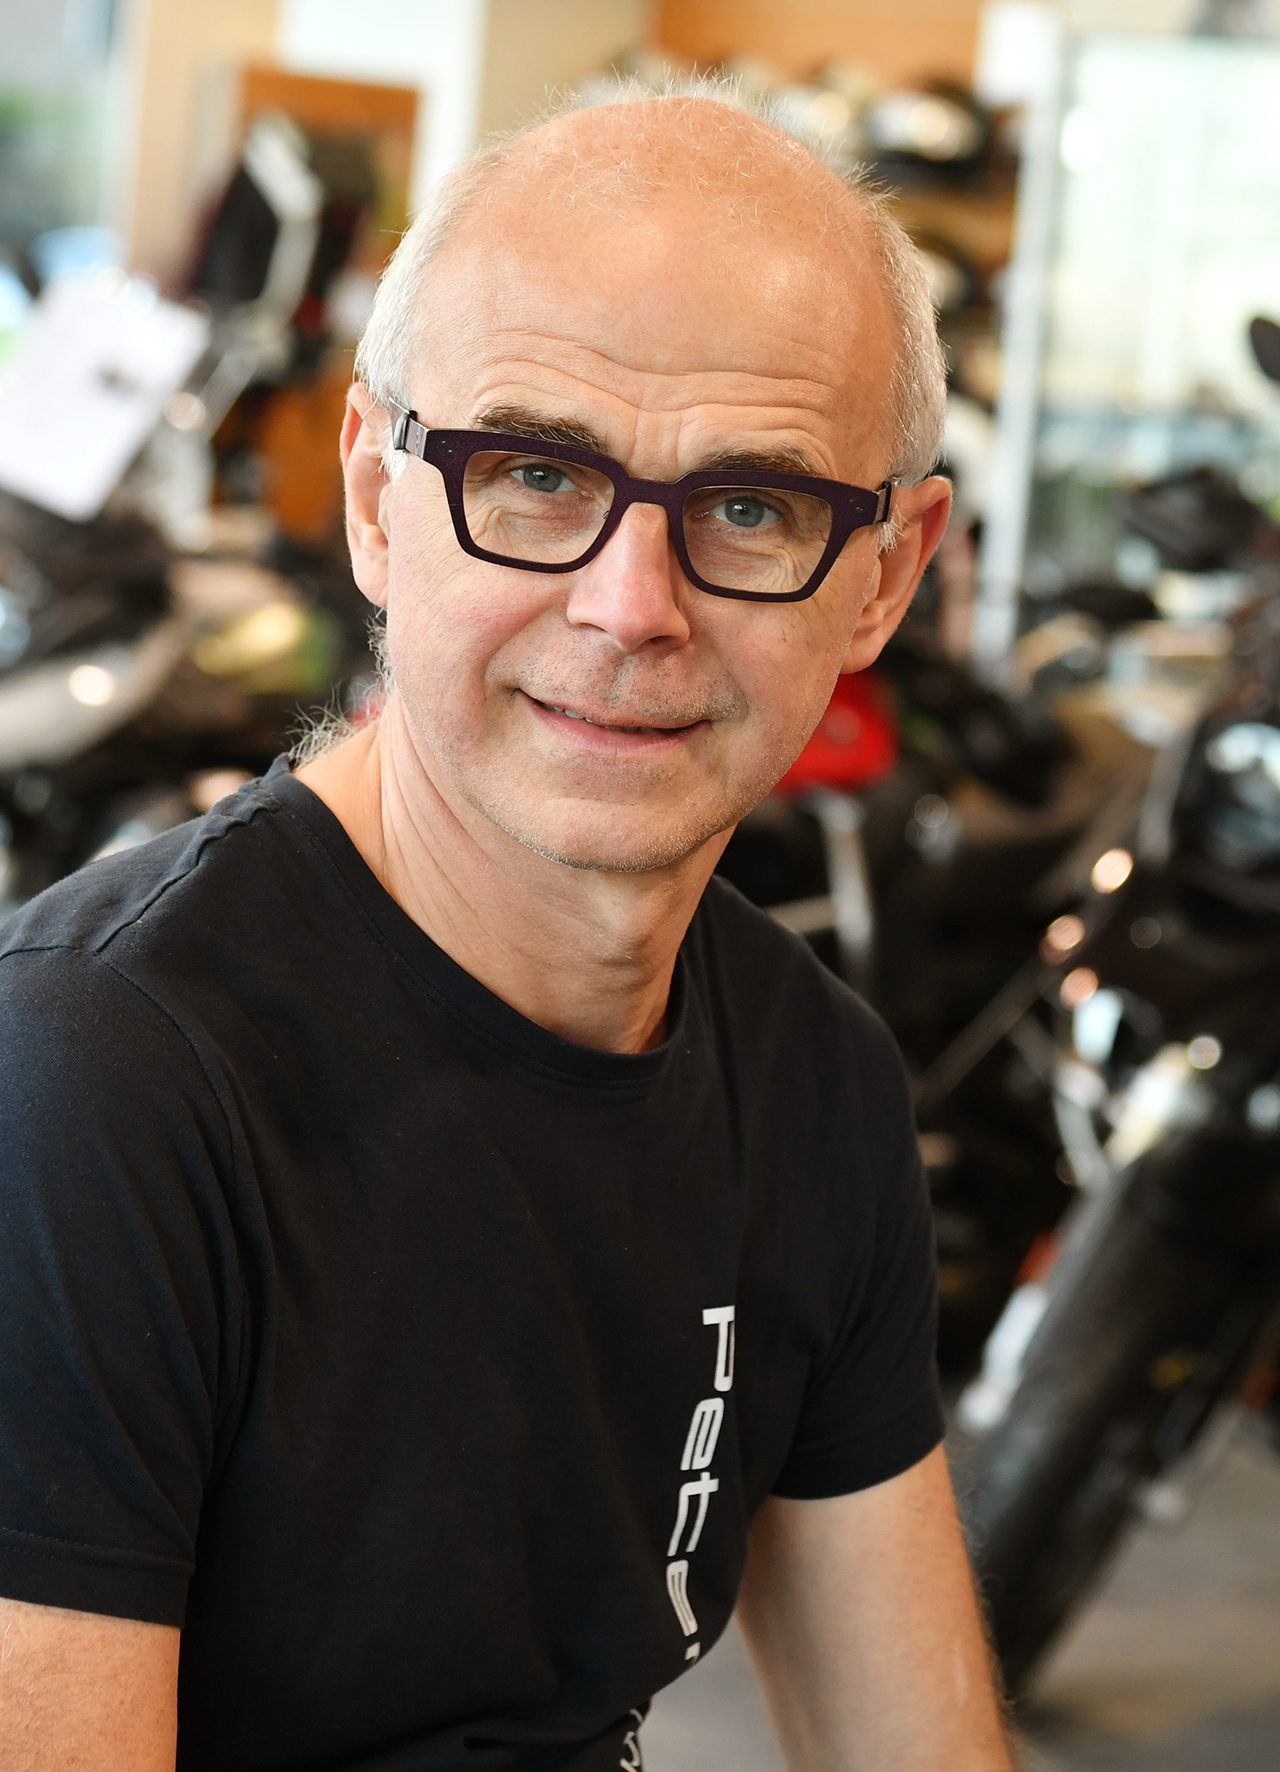 Filip Podevijn